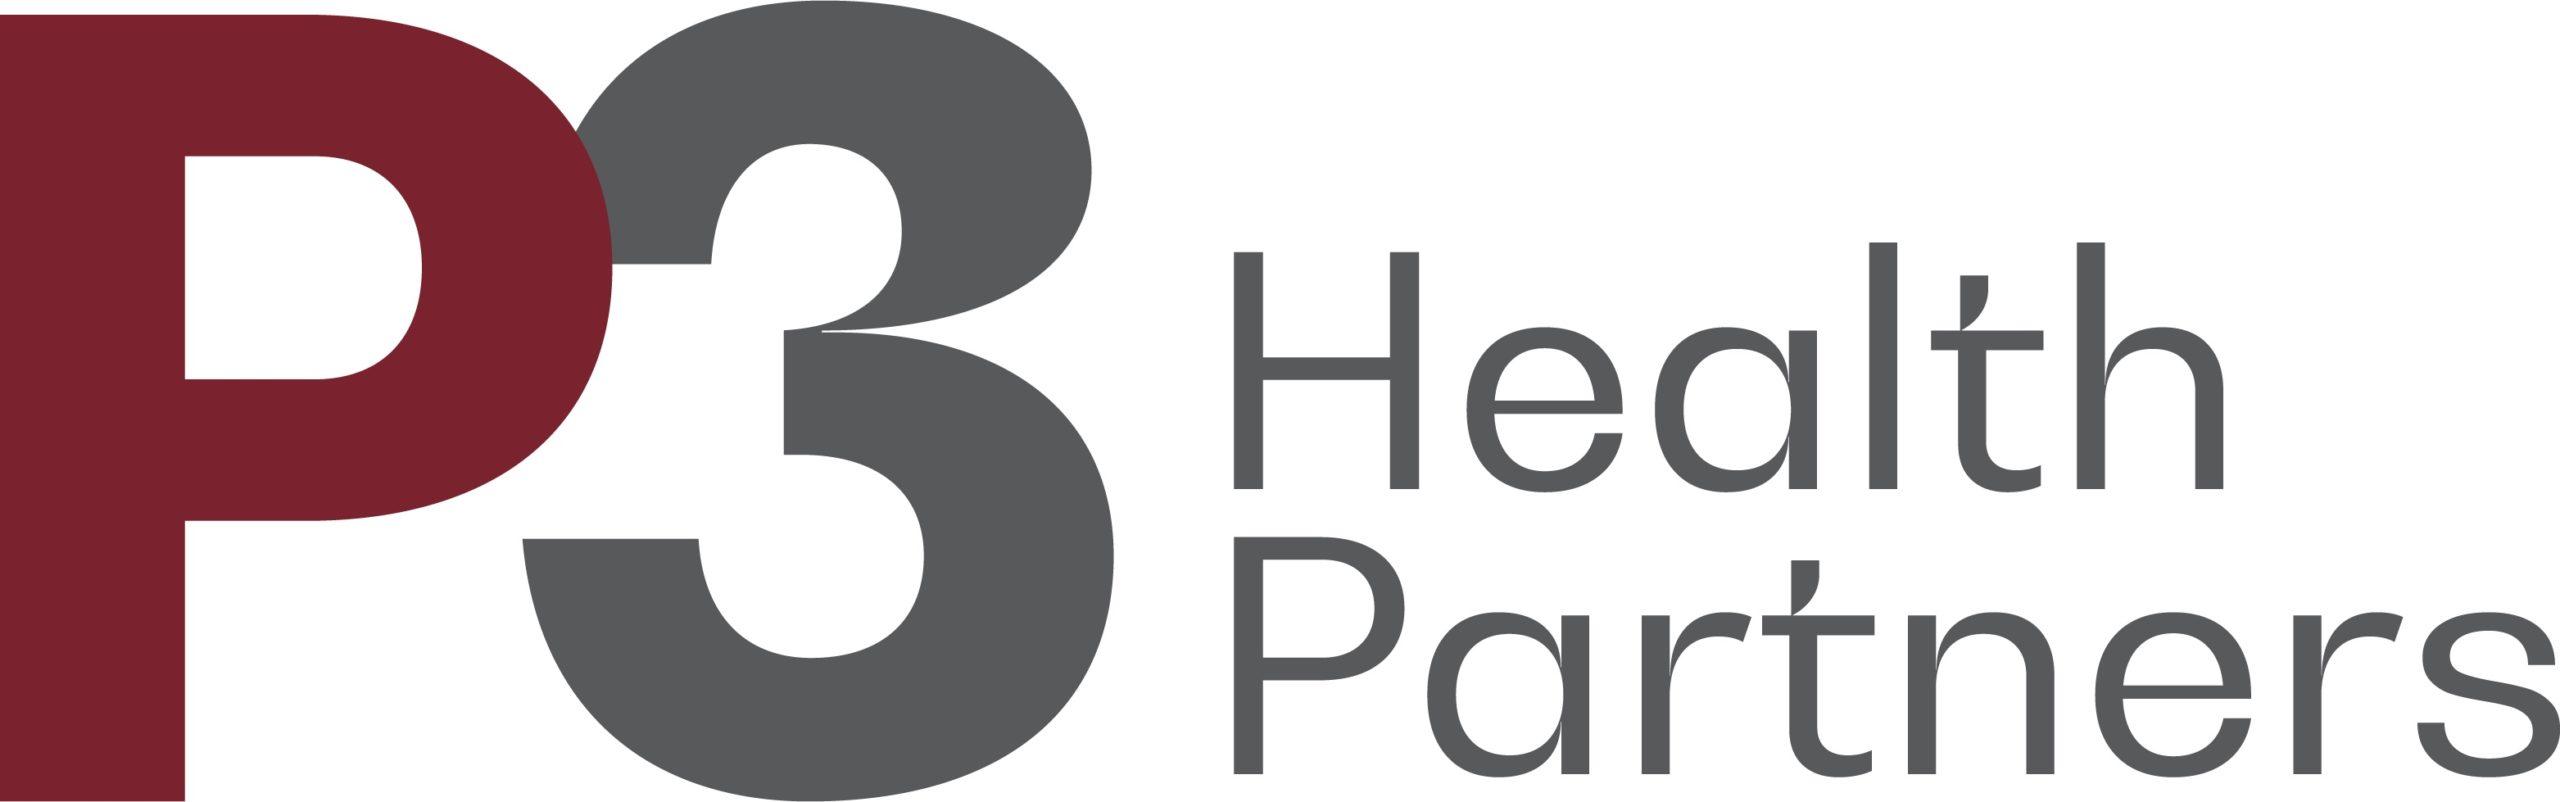 P3 Health Partners